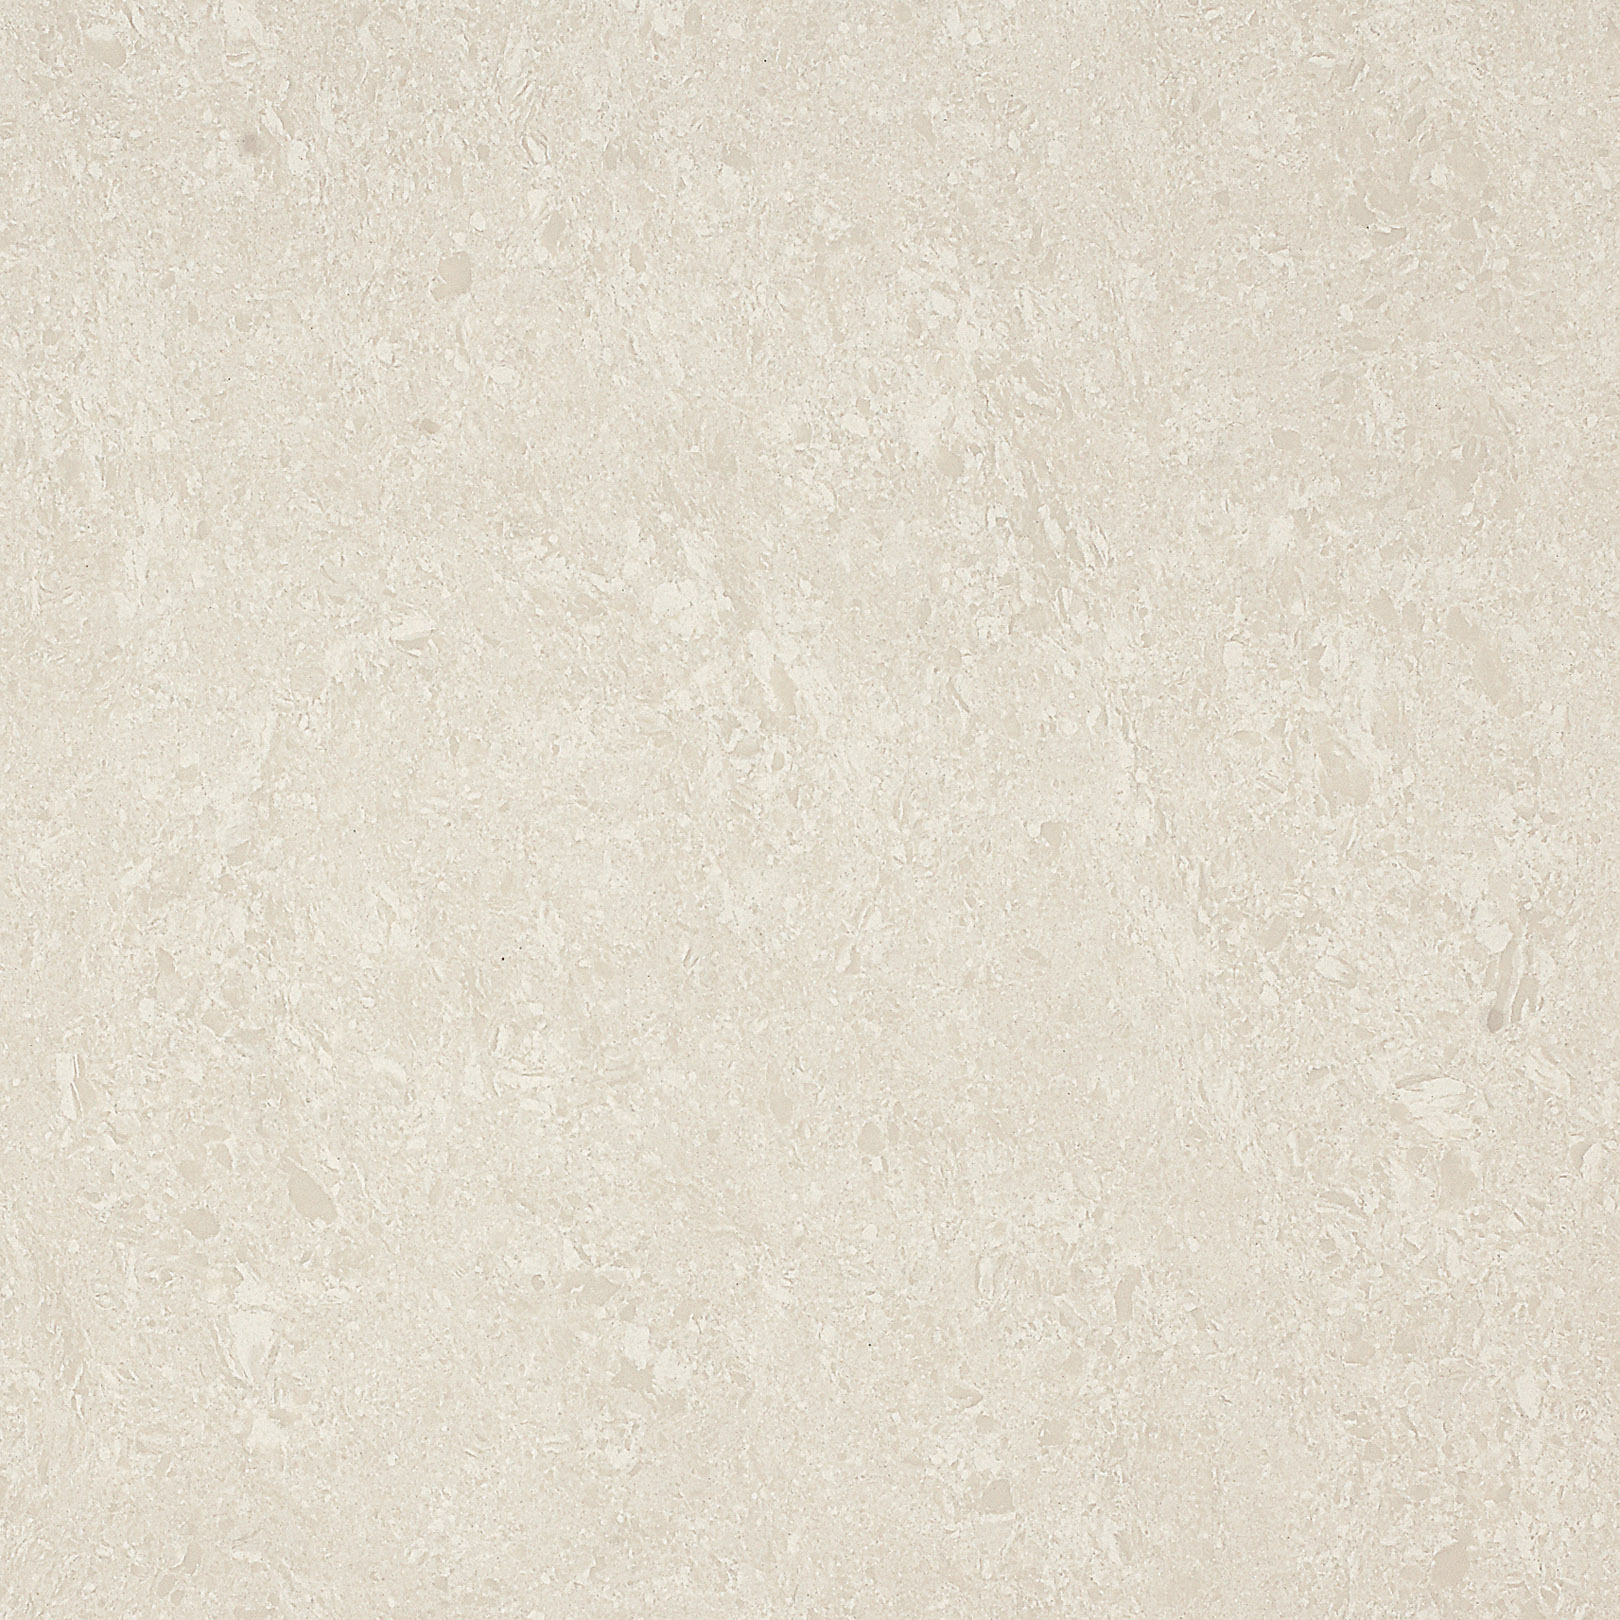 Stunning Single Tile Images - The Best Bathroom Ideas - lapoup.com